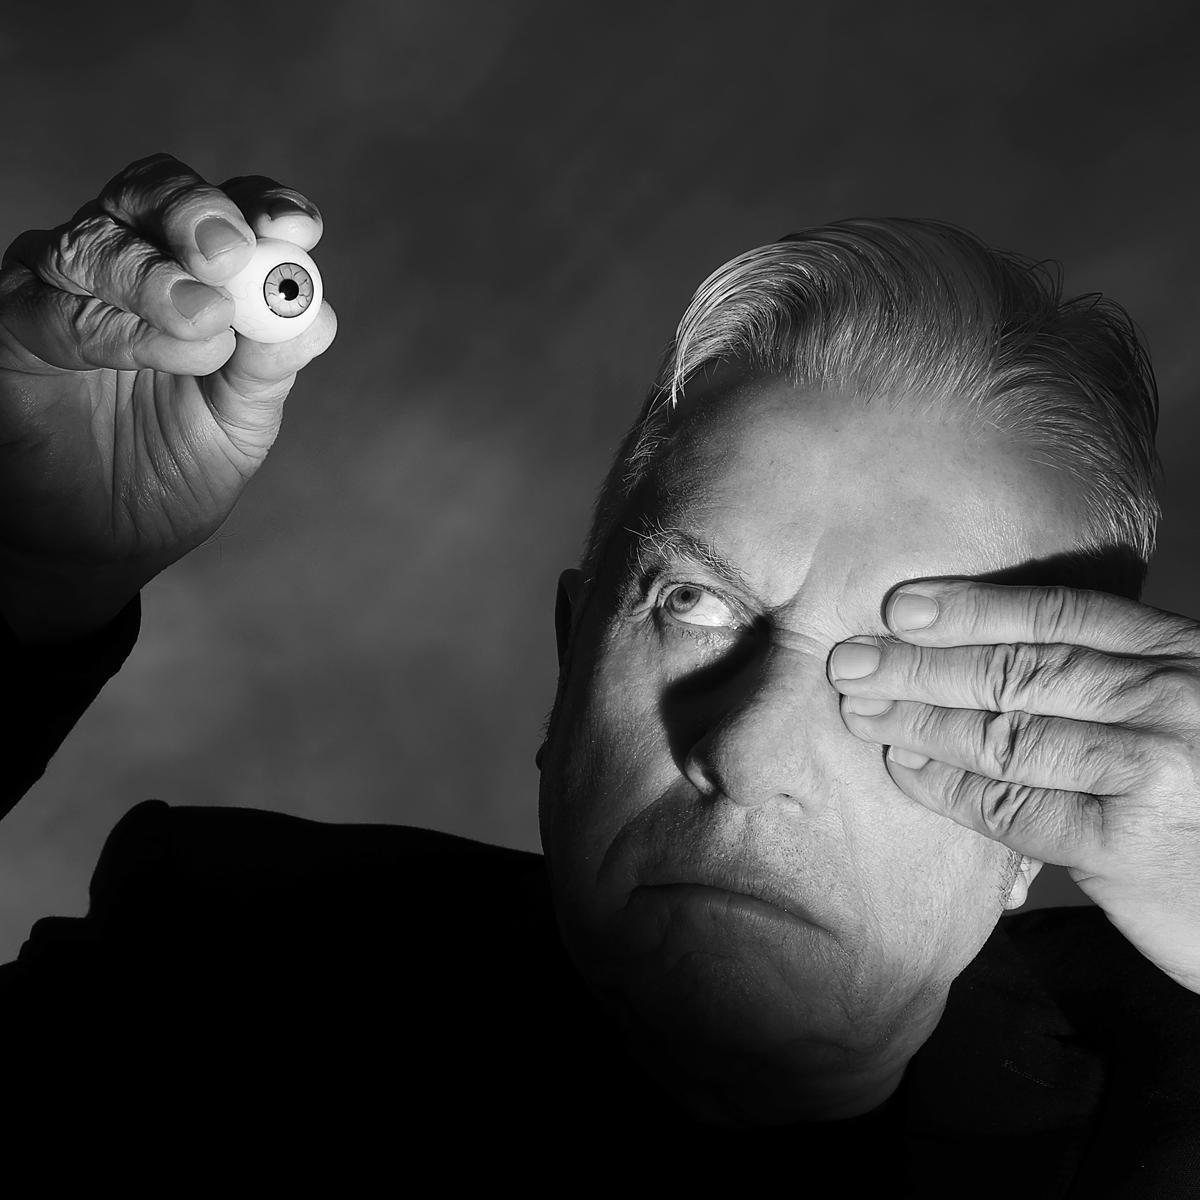 Artistic Portrait Photographer Creative Photography Julian Hanford